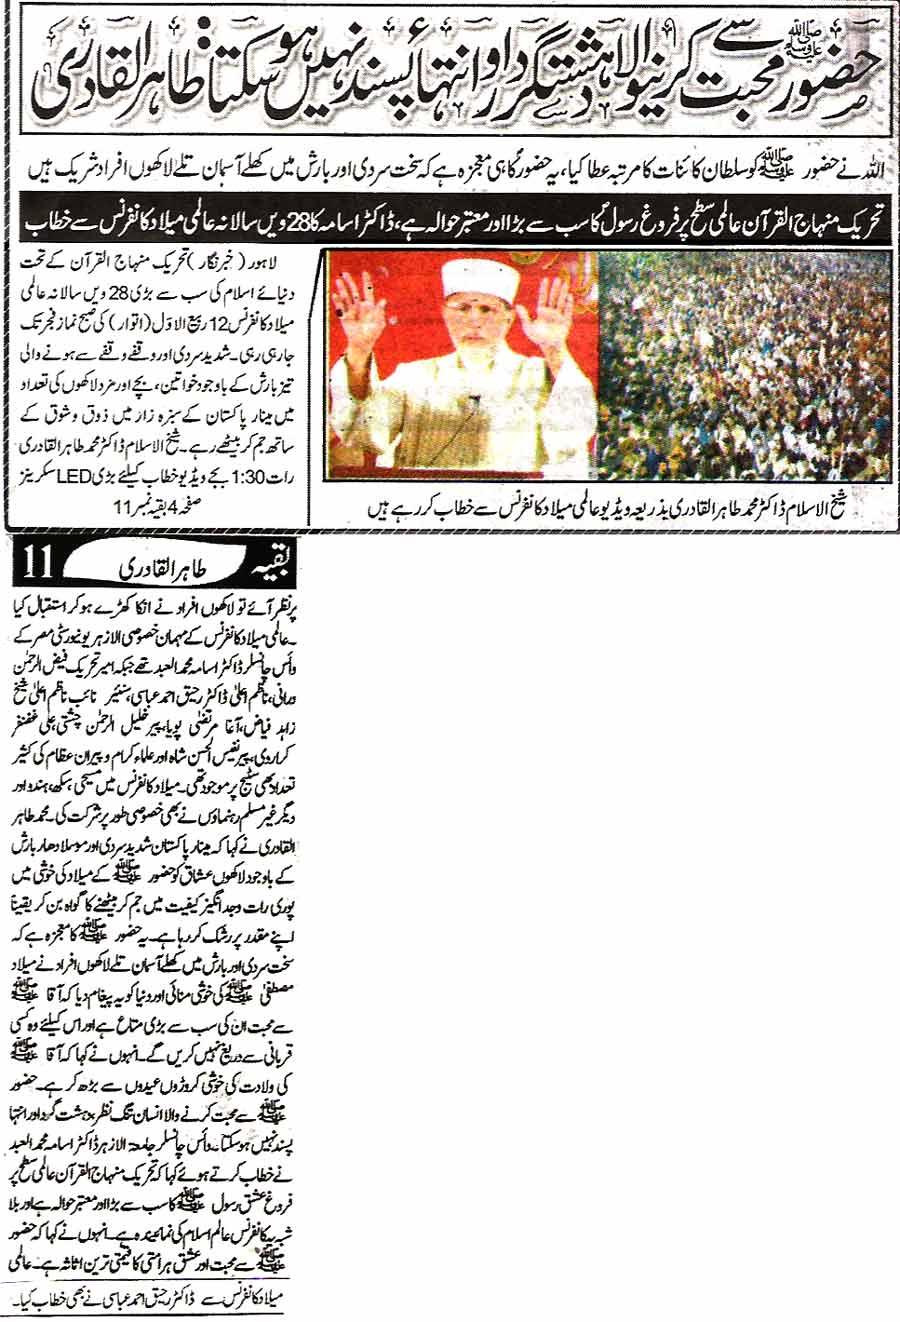 تحریک منہاج القرآن Minhaj-ul-Quran  Print Media Coverage پرنٹ میڈیا کوریج Daily Ash-sharq Page 1